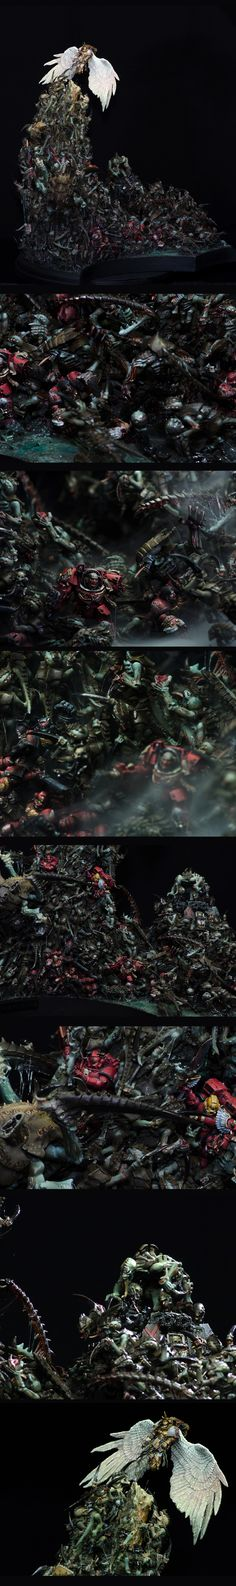 """The Last Light"" - Tyranid Swarm versus the Blood Angels"